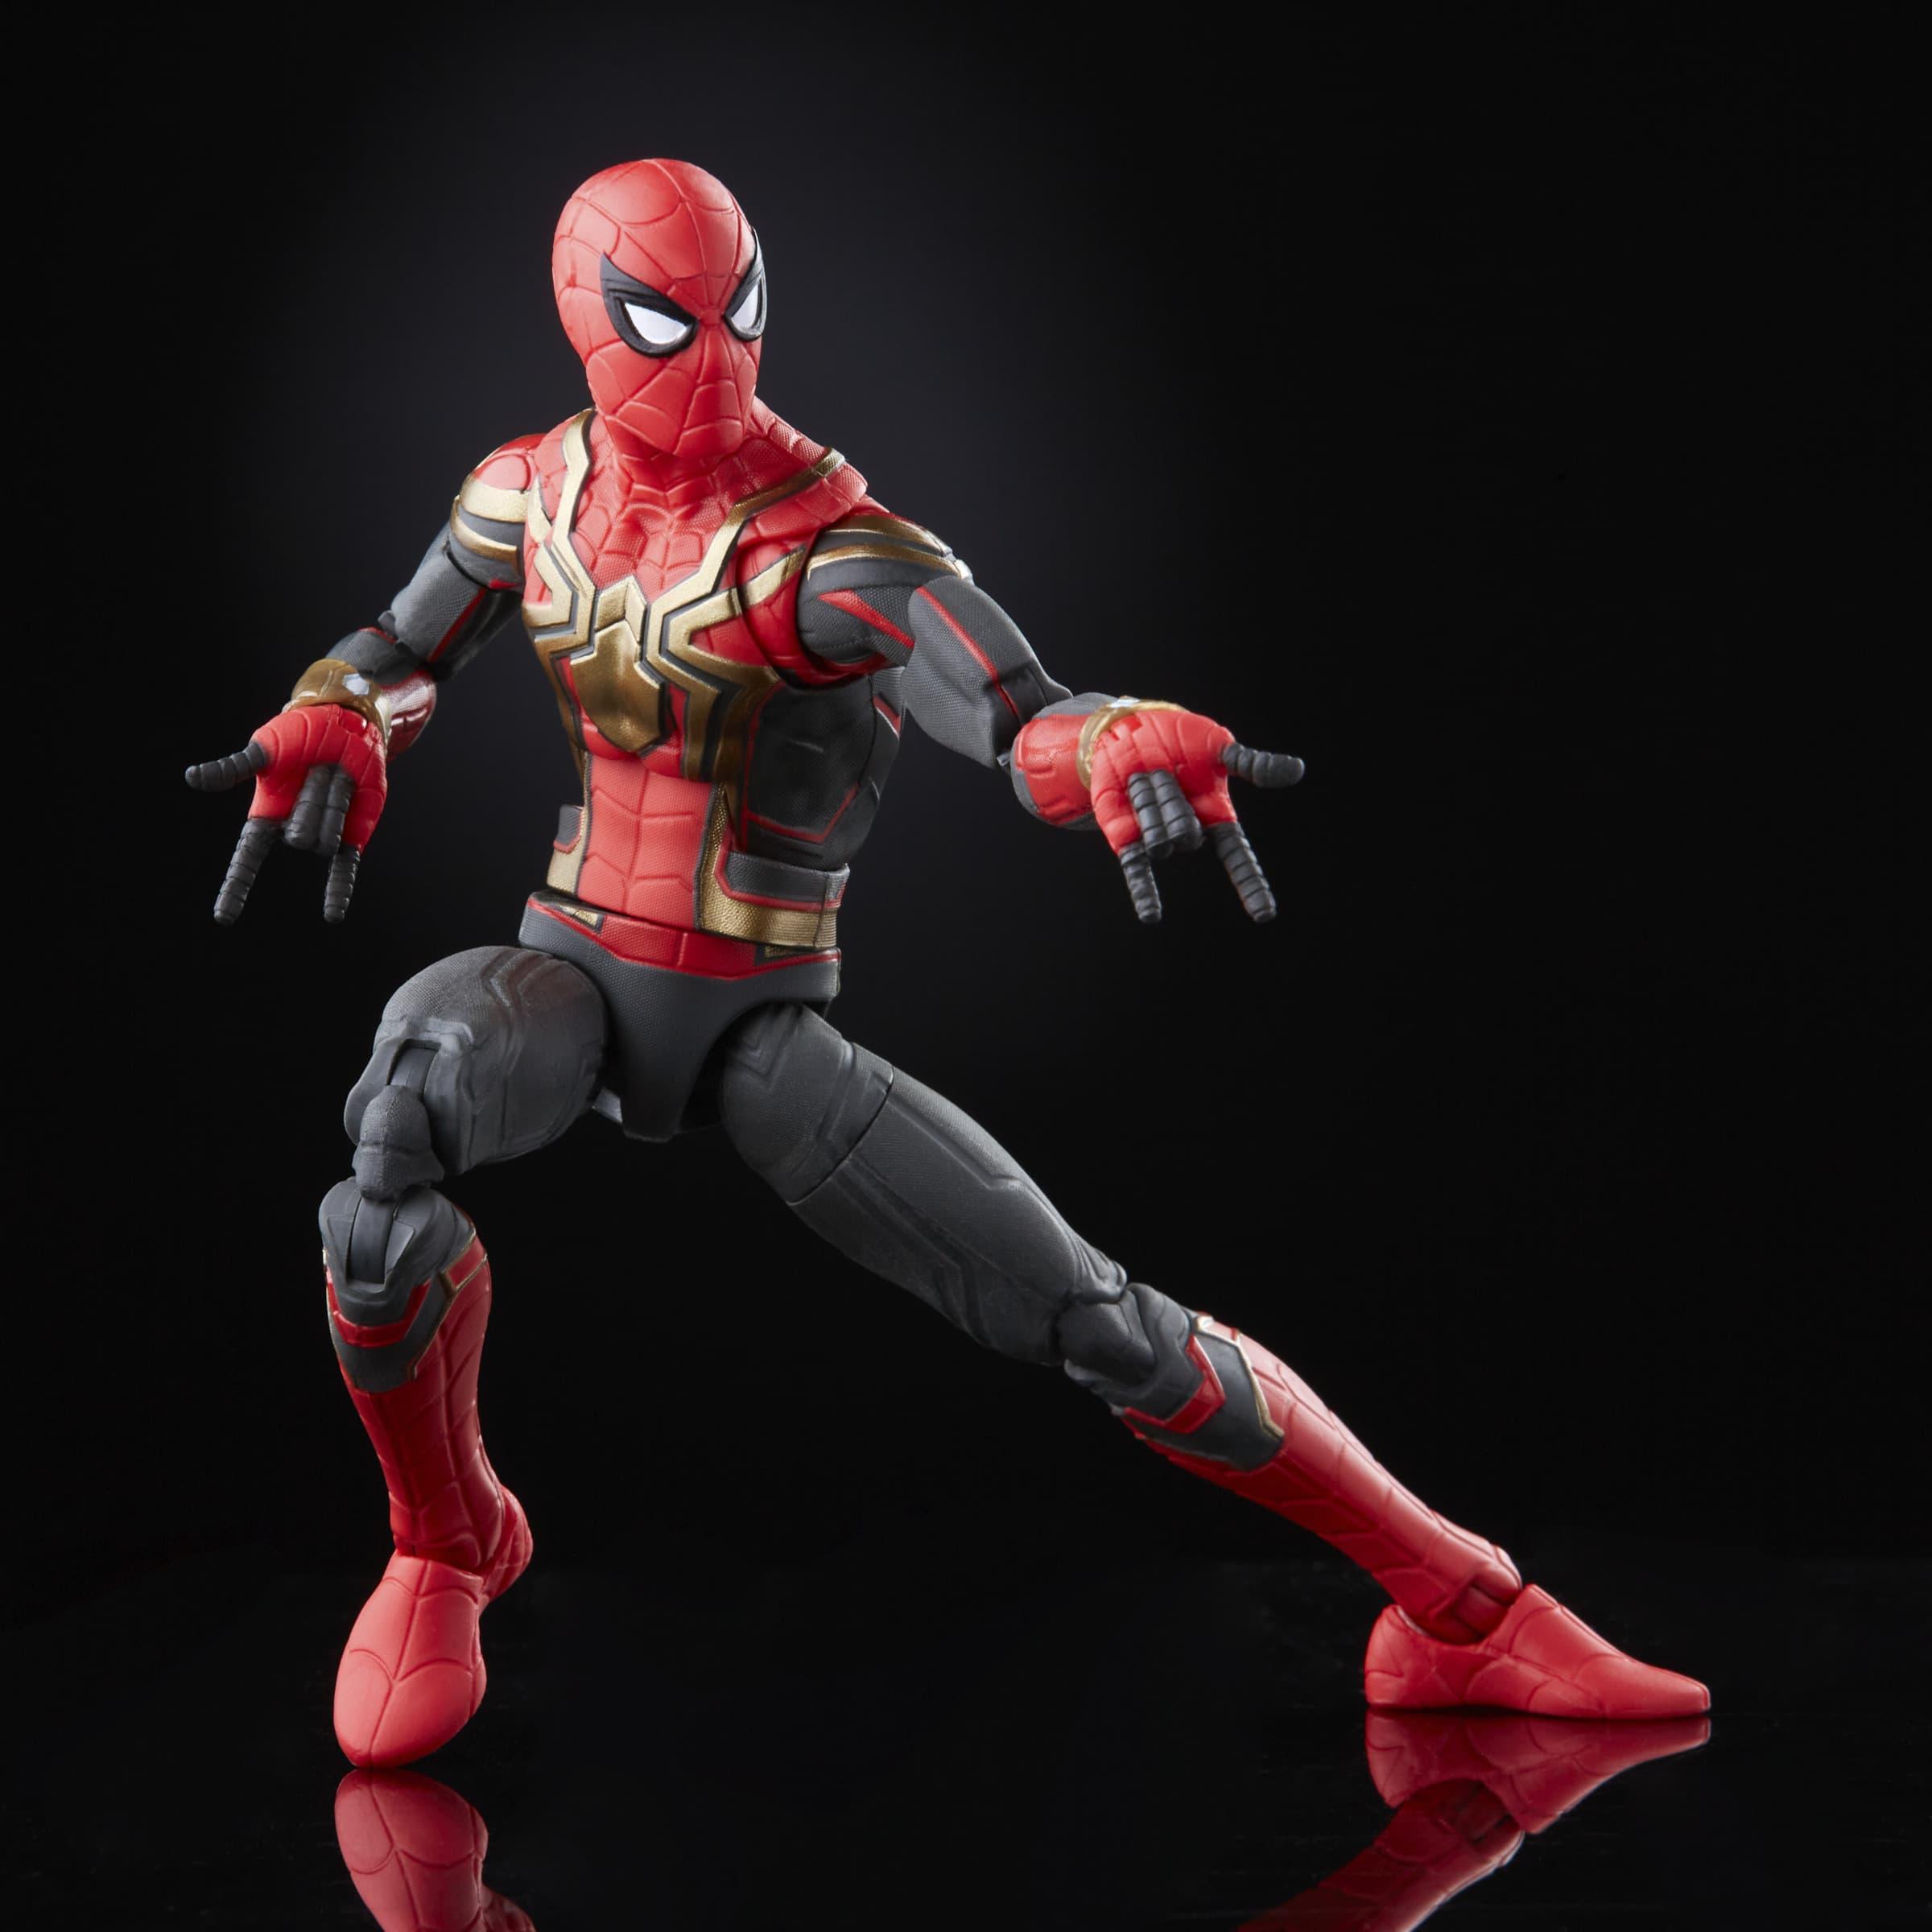 Hasbro Marvel Legends Figure - Spider-Man